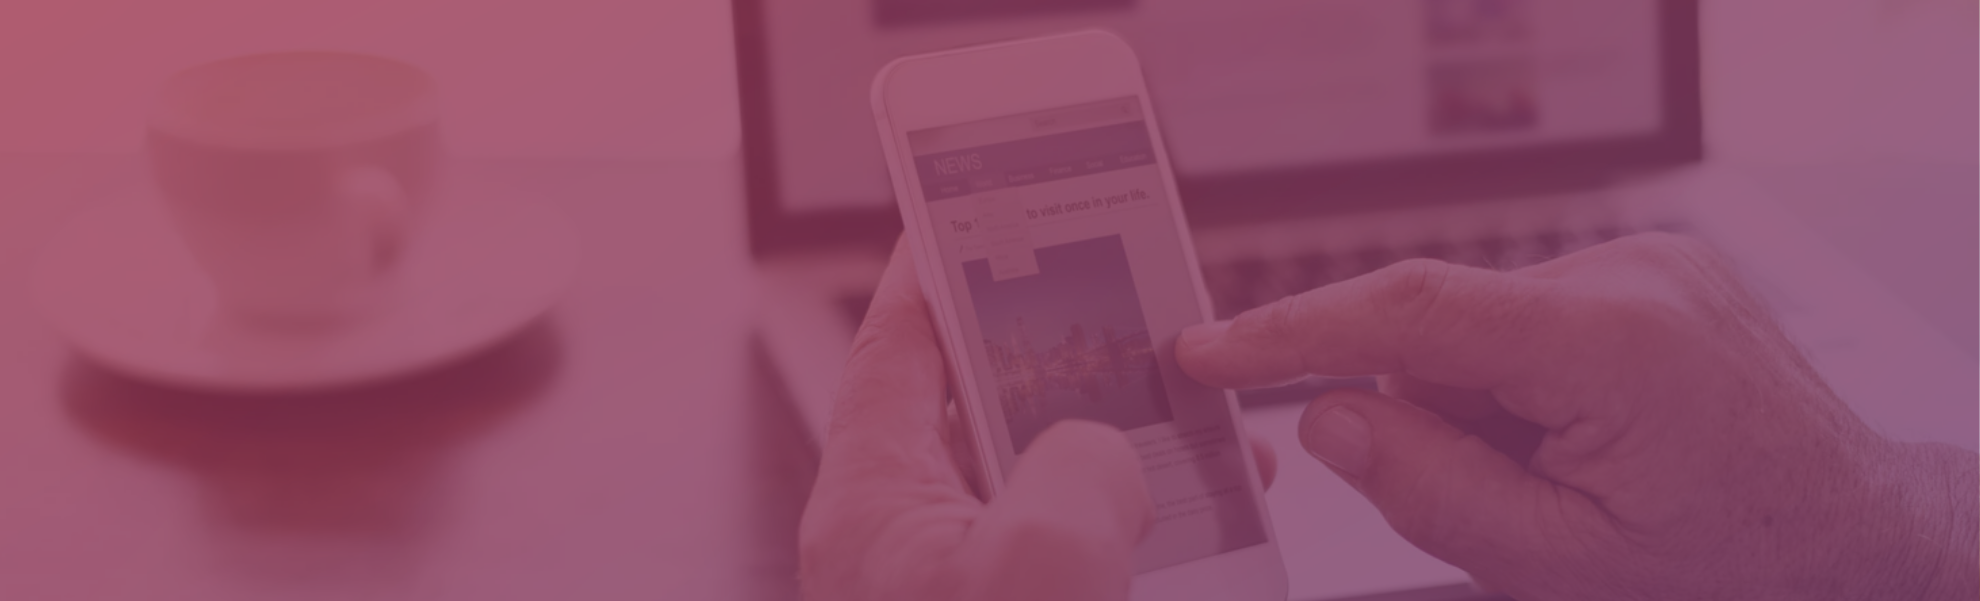 header content blog